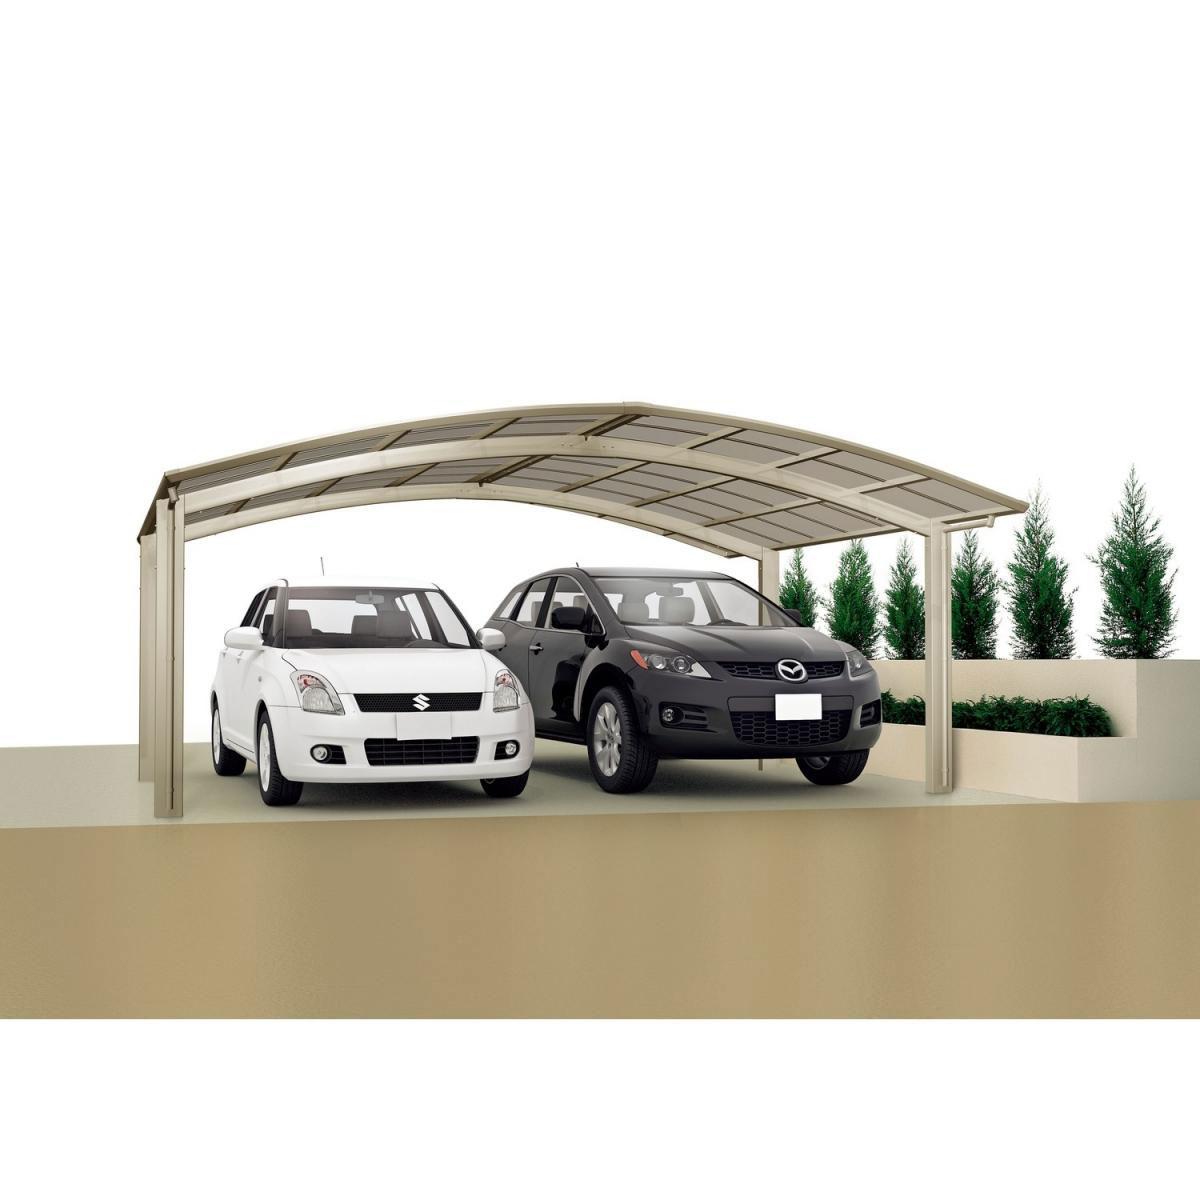 "Carports - Carport Alu ""Portoforte 80 M Ausführung"" Edelstahl Look 100  - Onlineshop Hellweg"